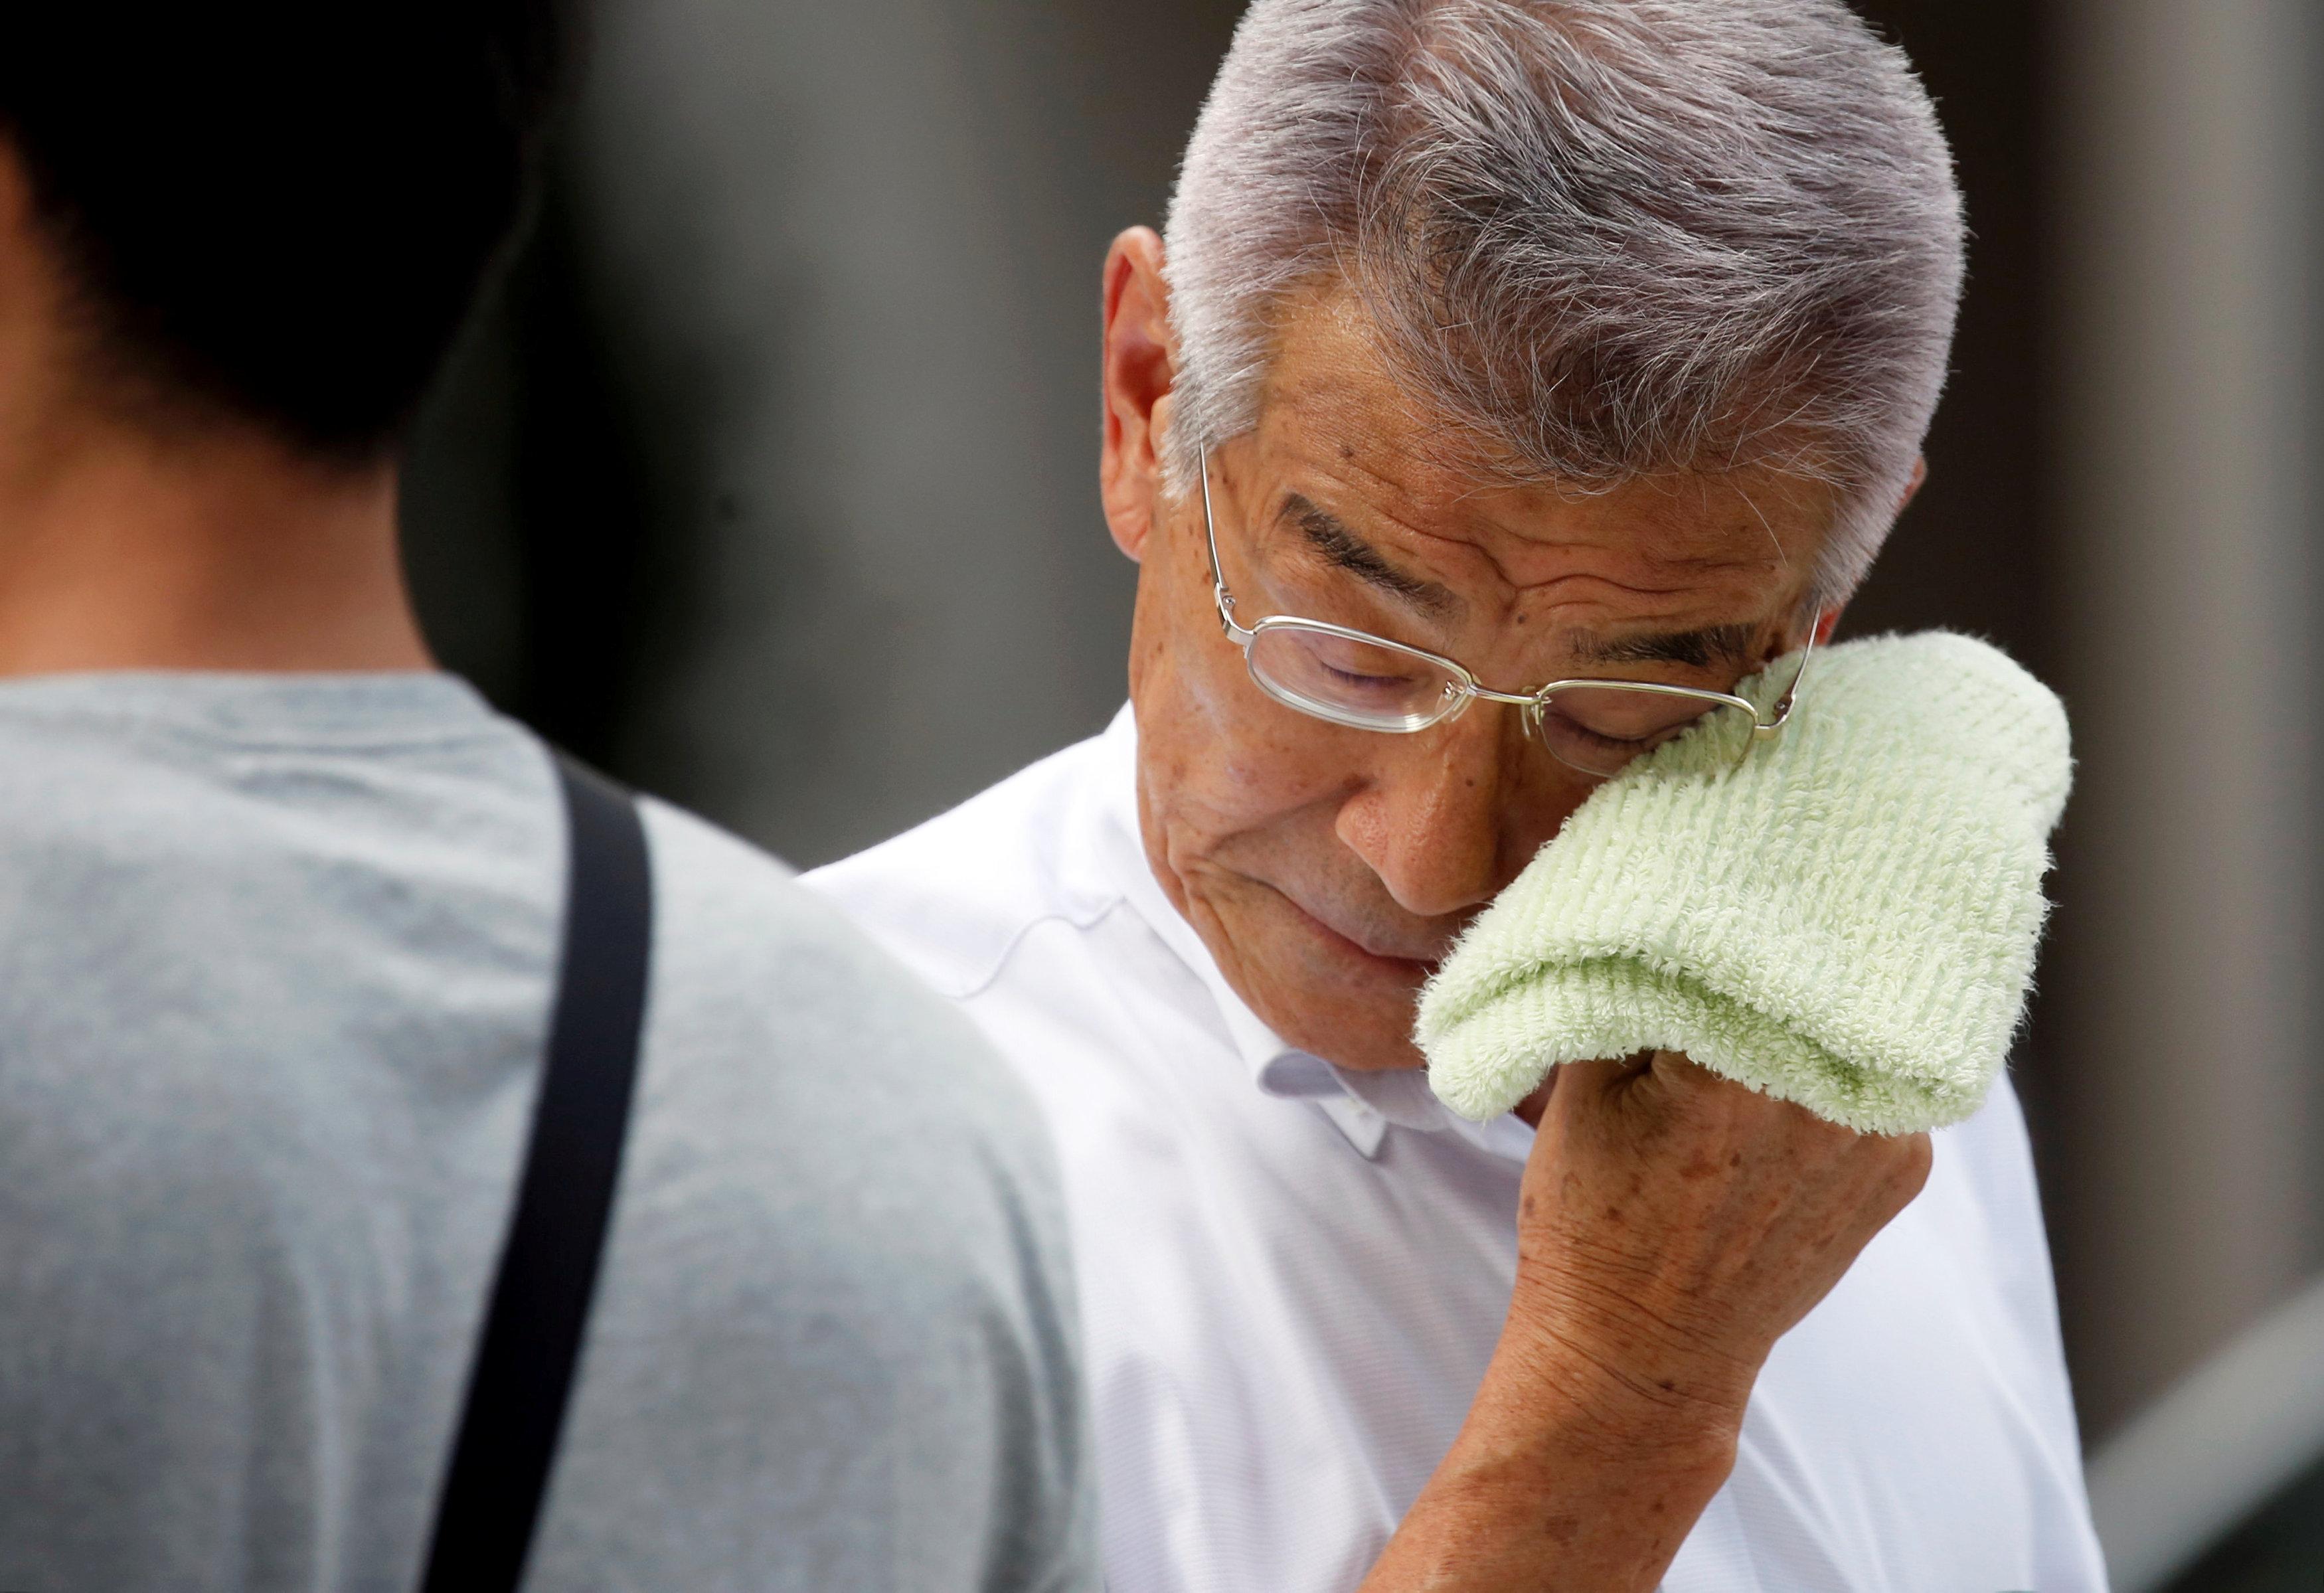 Japan heatwave - man wipes sweat off his face